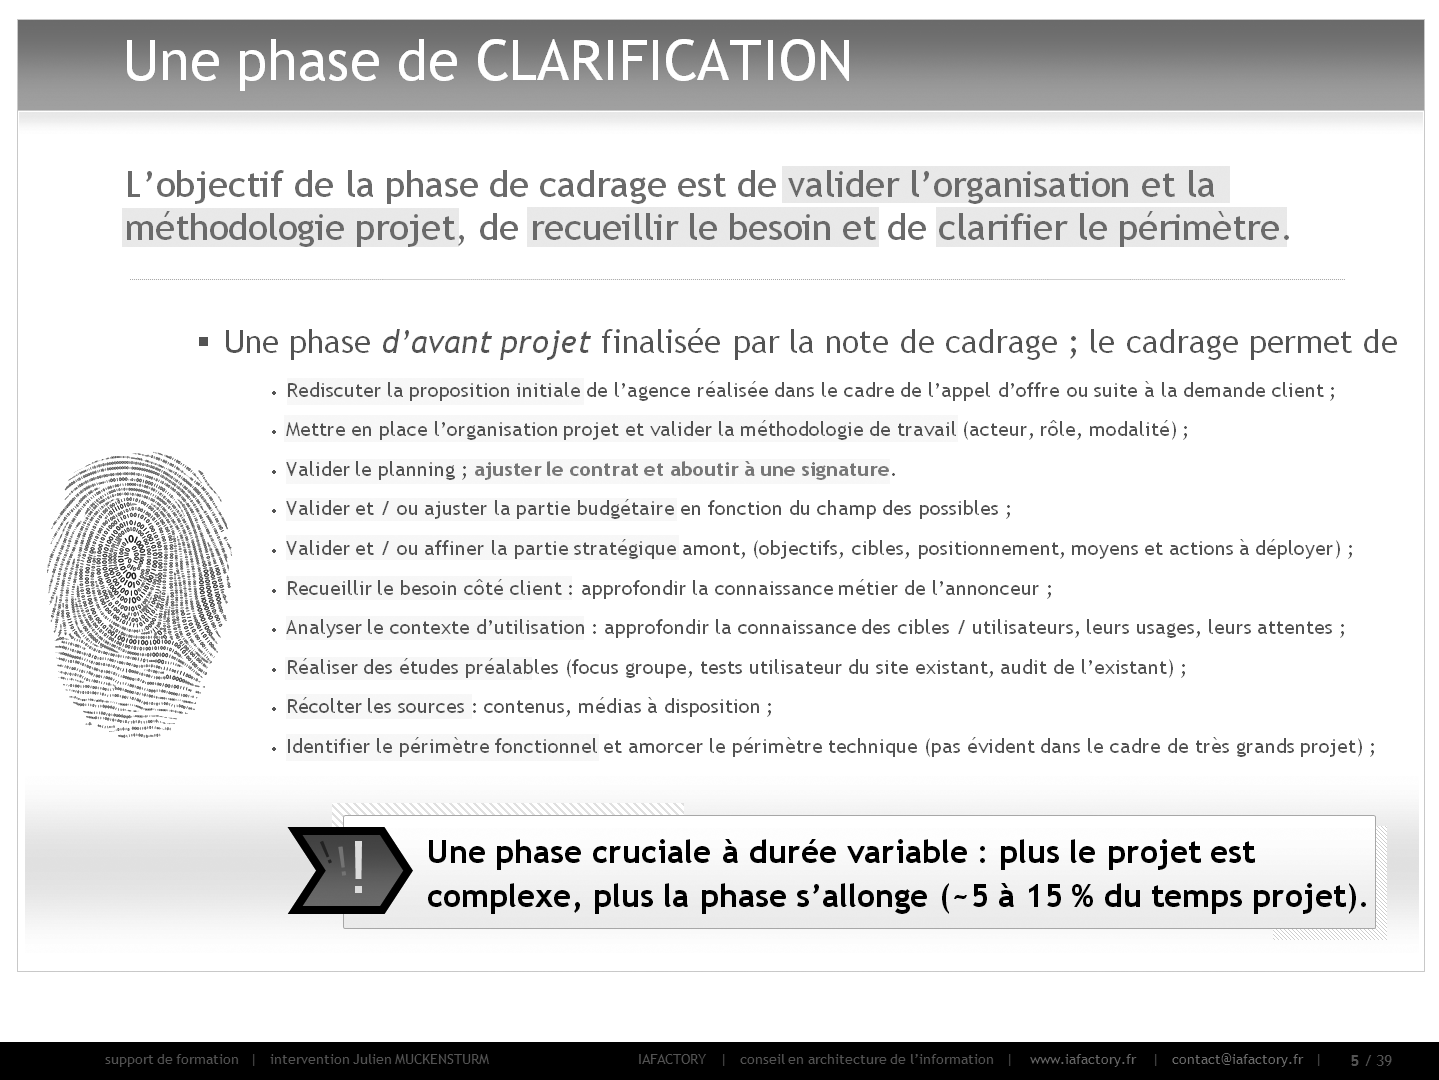 formation universitaire en gestion de projet – cadrage (objectif)